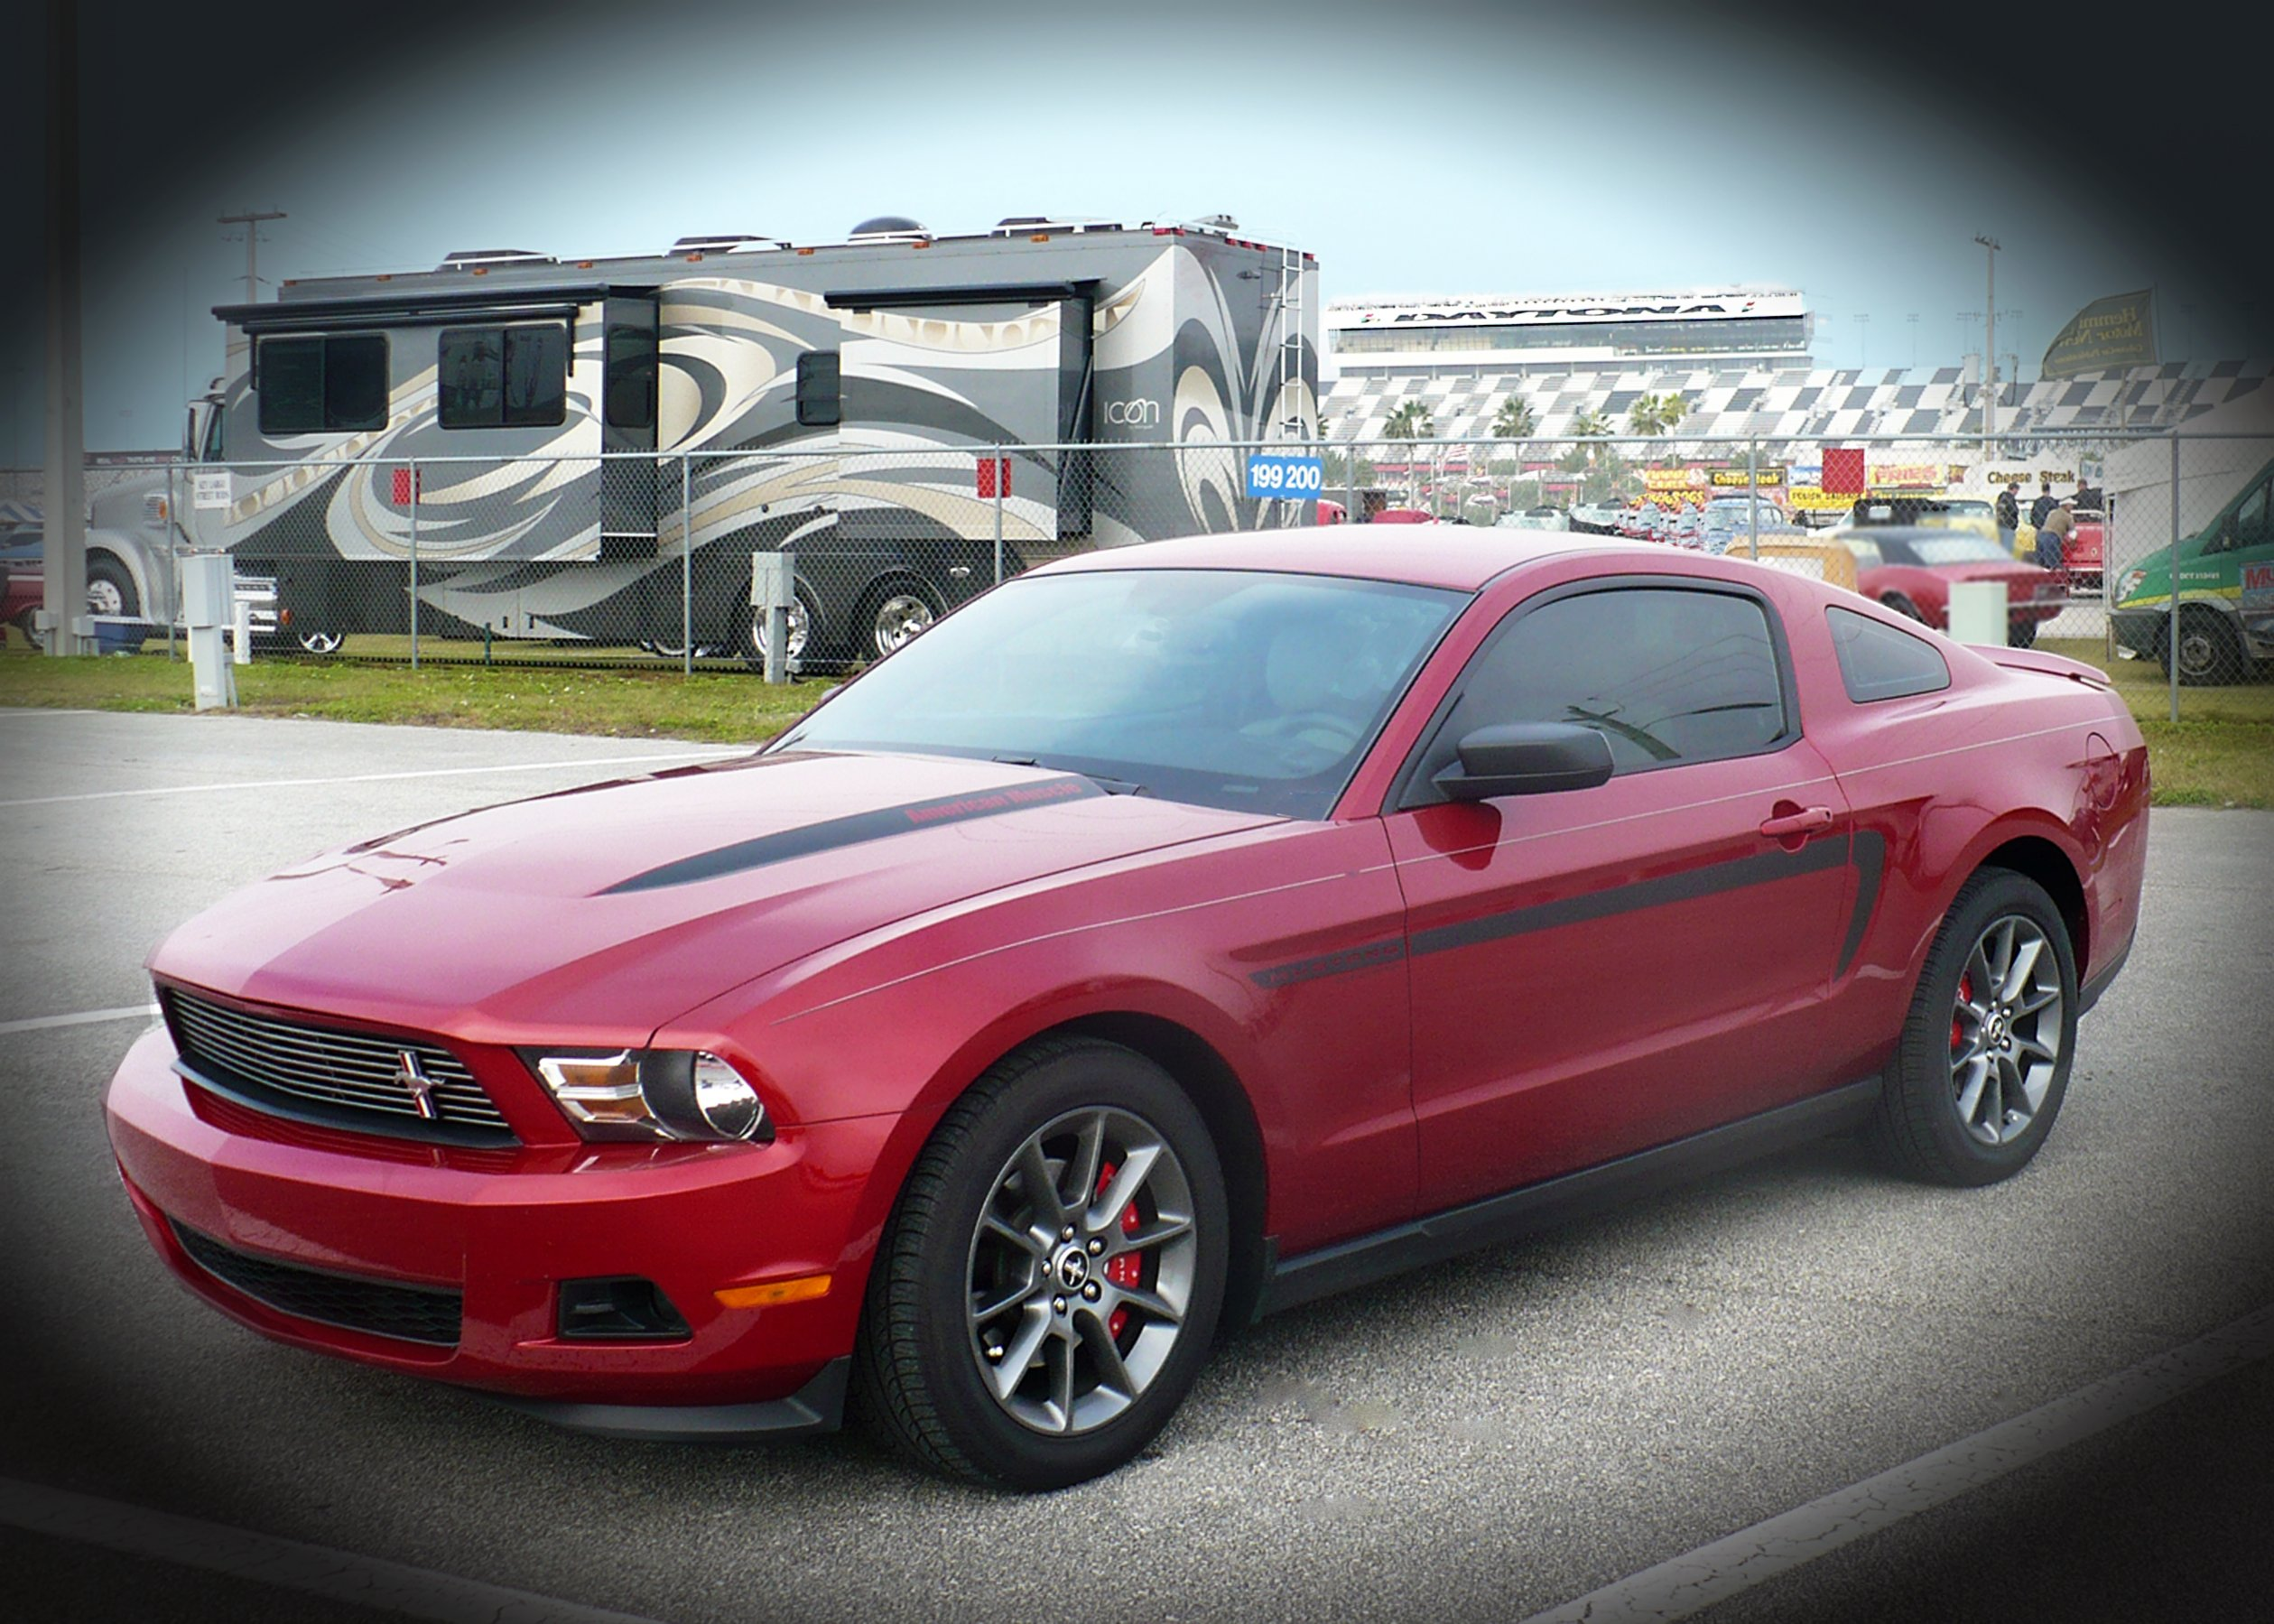 Click image for larger version  Name:Daytona Mustang.jpg Views:105 Size:641.3 KB ID:192531